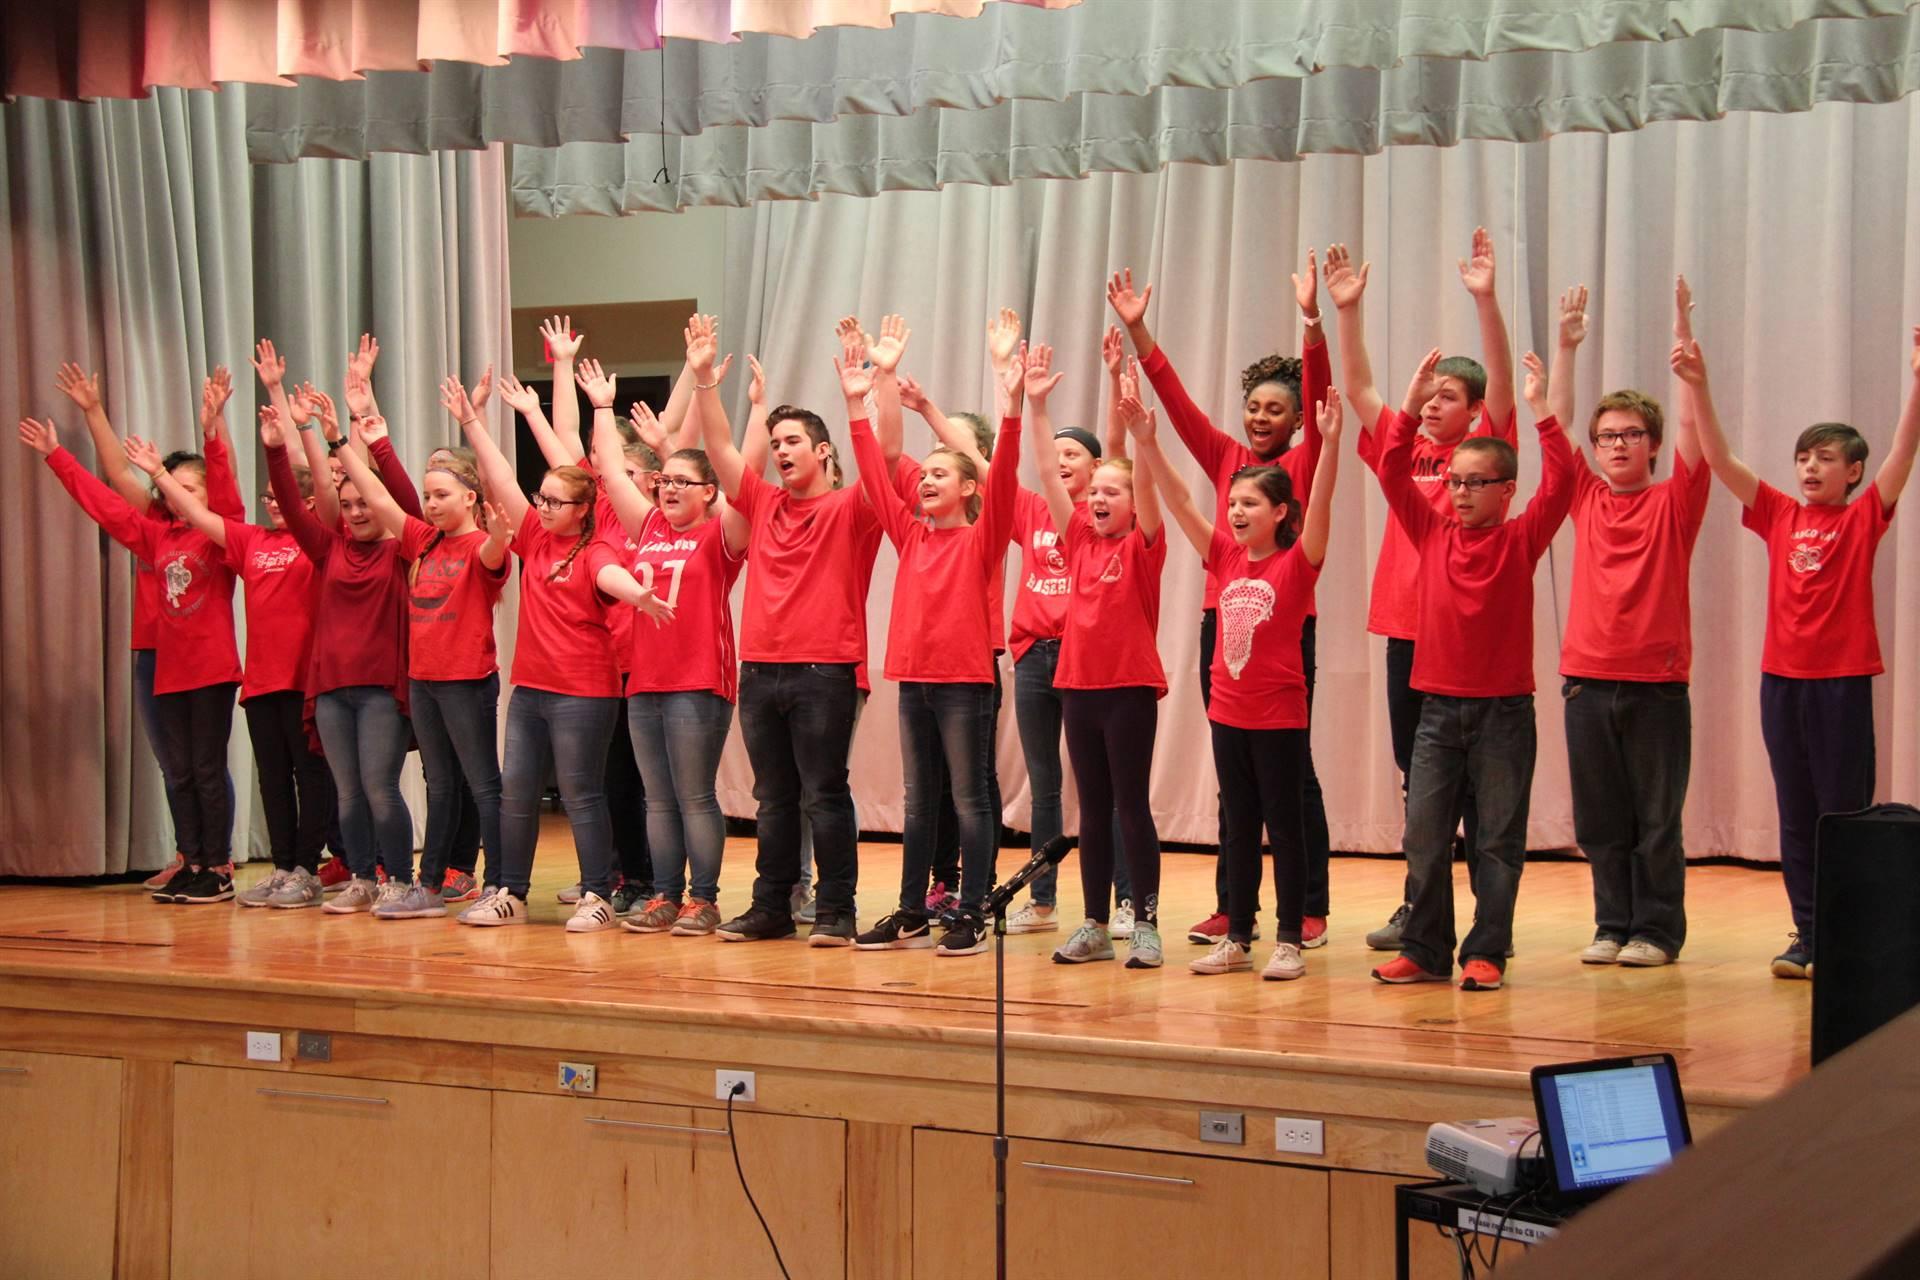 sneak preview performance at chenango bridge elementary 12